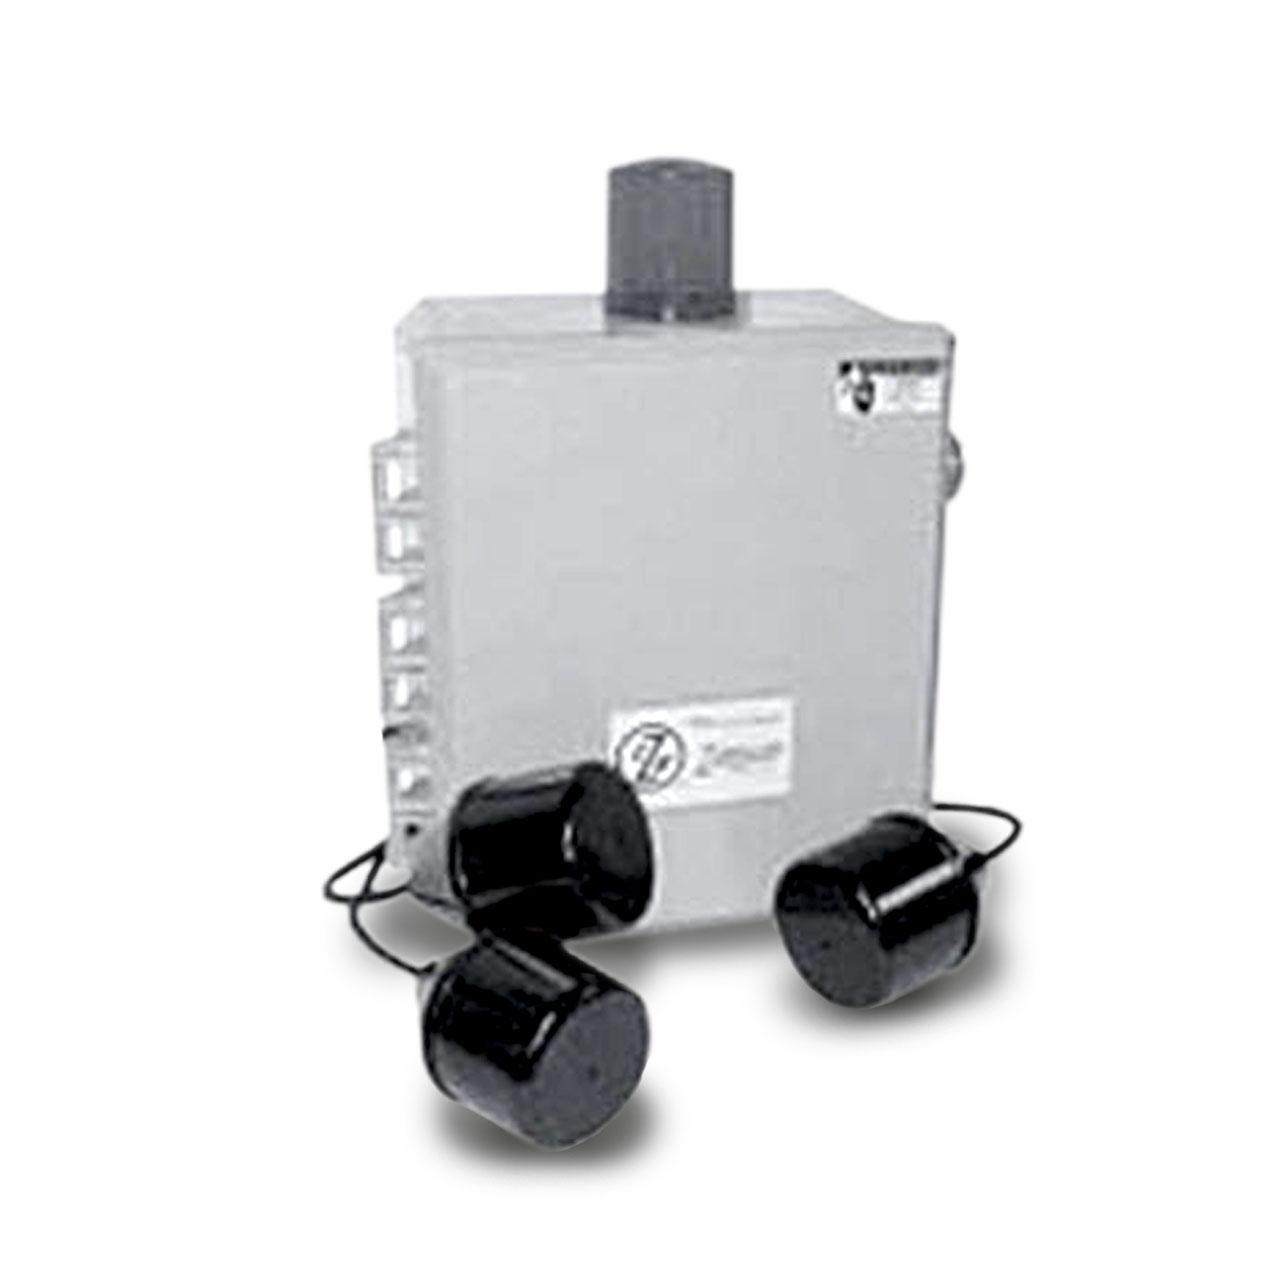 duplex pump control panel wiring diagram fog light toyota zoeller 27 images